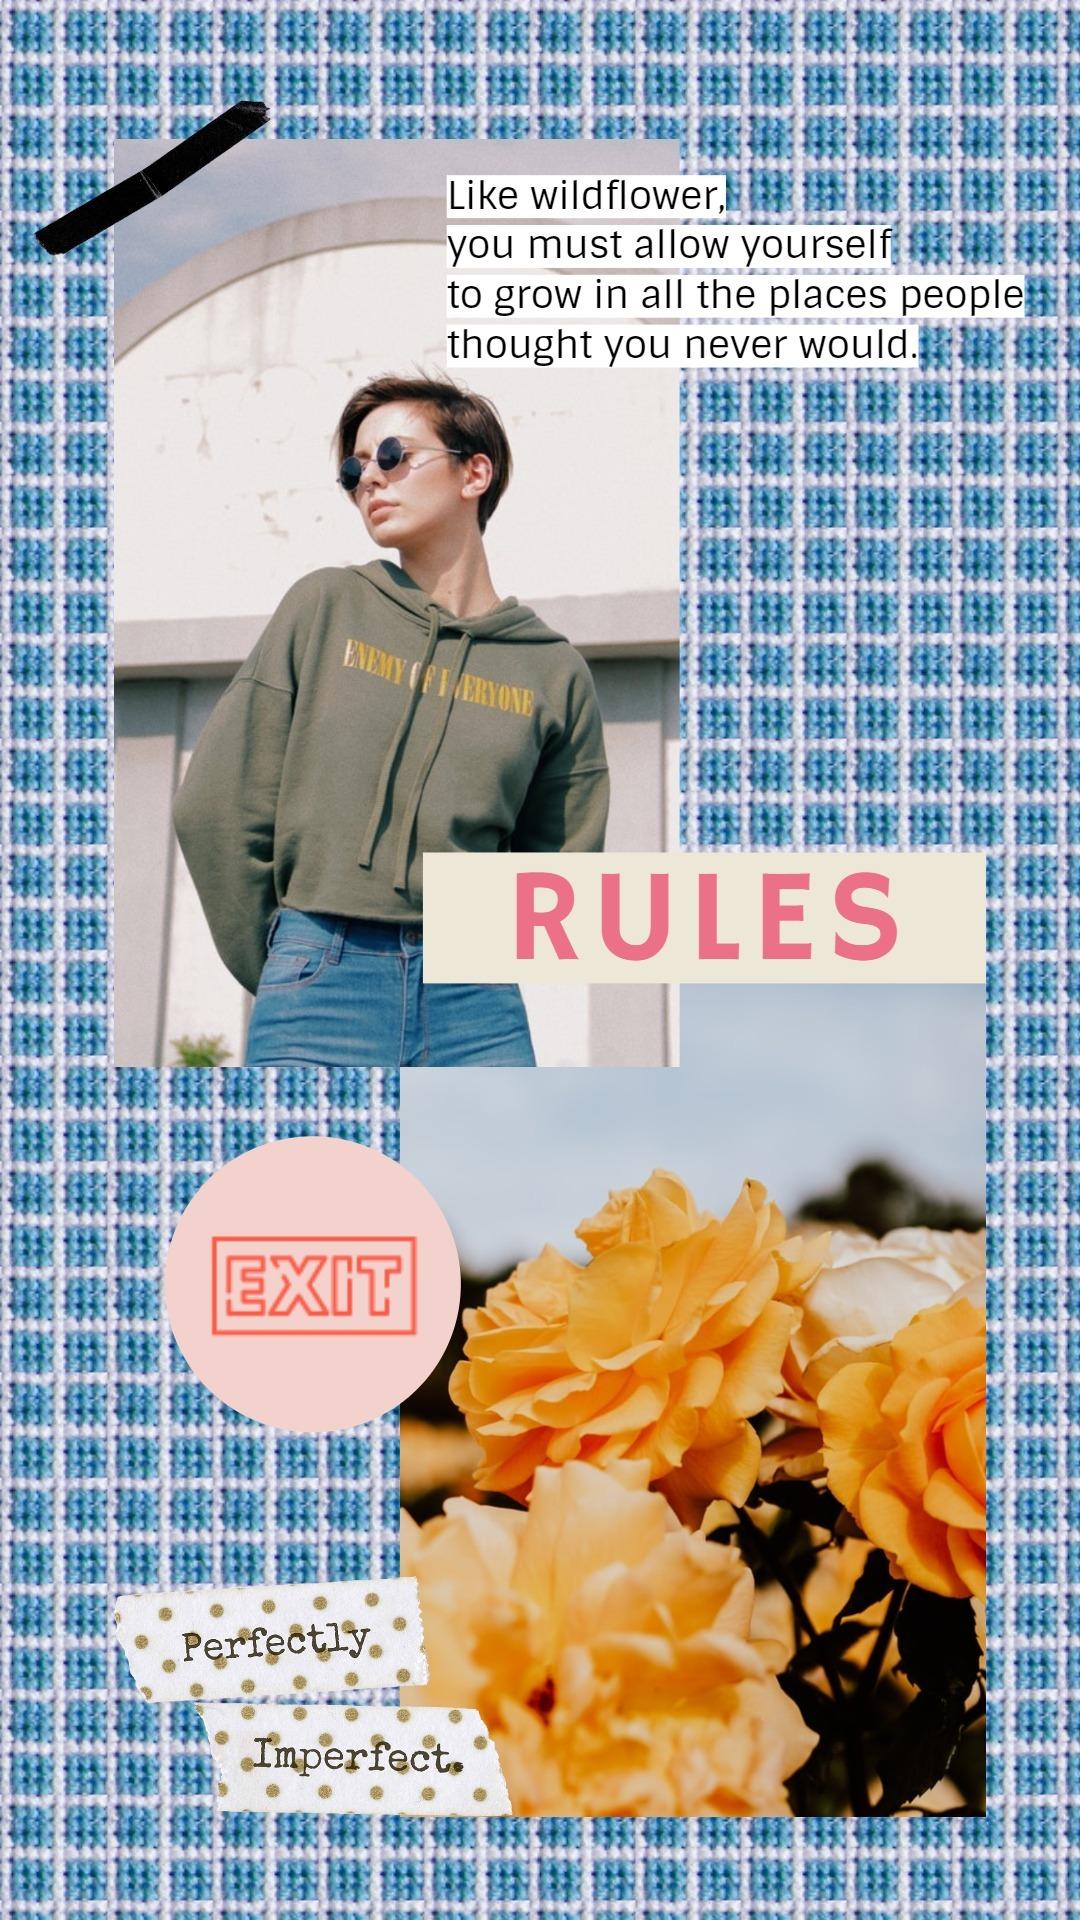 rules9x6_wl_20190704